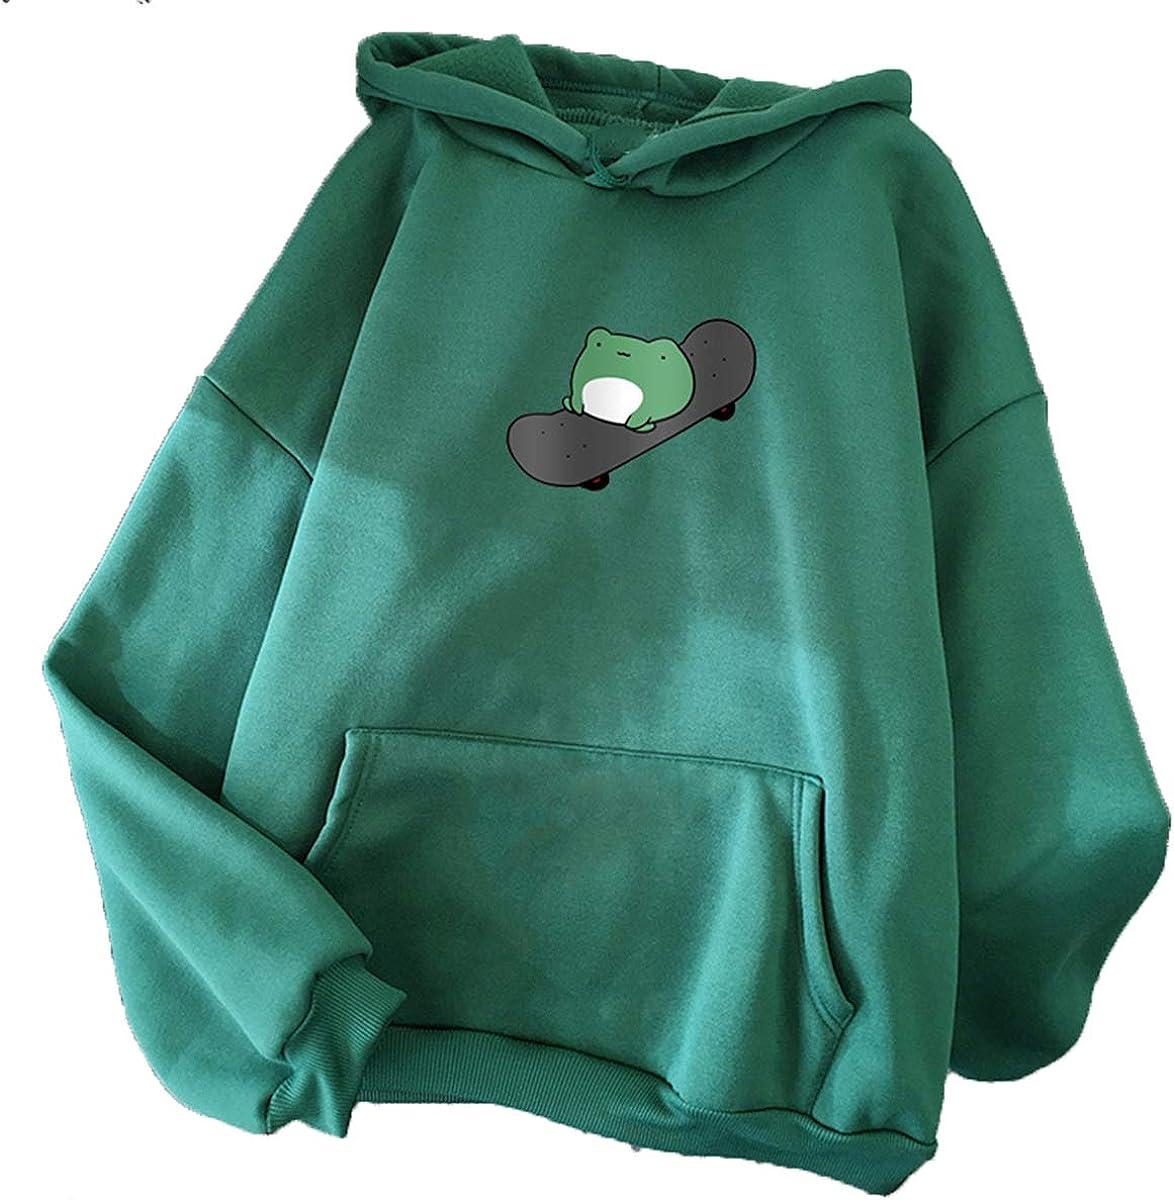 CORIRESHA Women's Pocket Hooded Sweatshirts Cute Frog Casual Long Sleeve Hoodie Pullover Tops